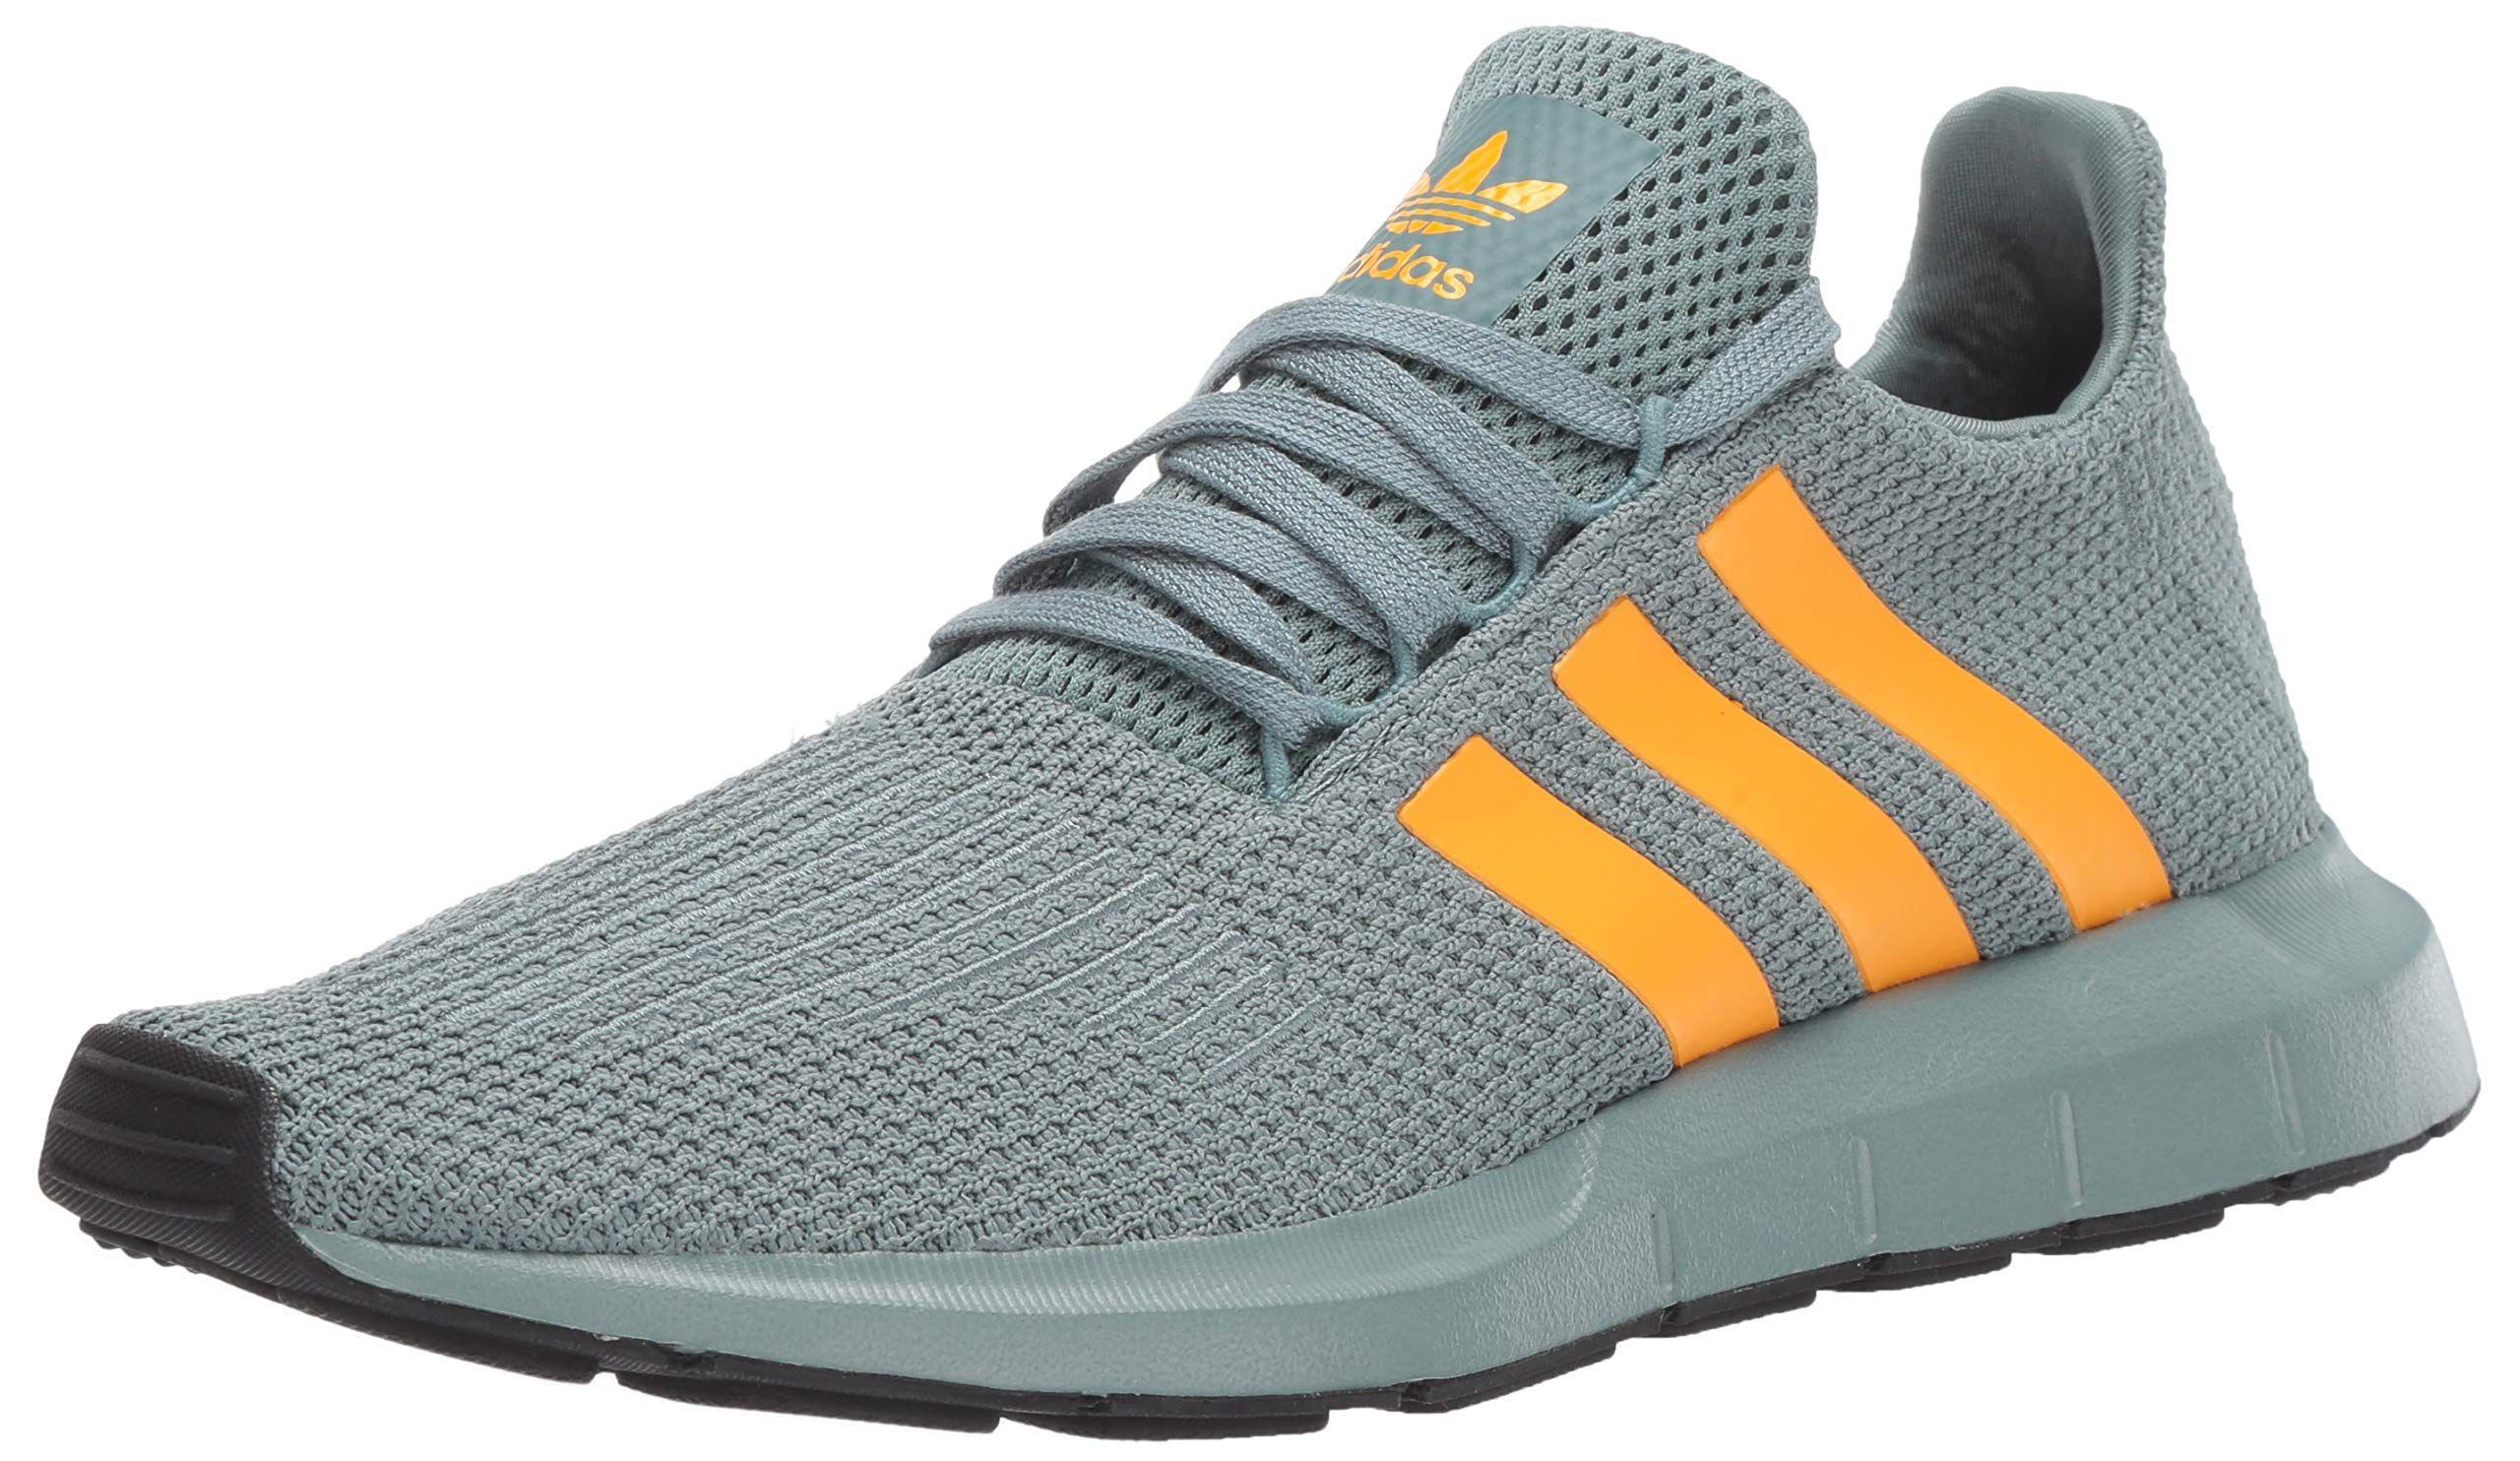 63db684b4 Air Cushion Fashion Breathable Lightweight Man Sneakers Cross Training  Athletic Walking Shoe Mans Black Size 9.5 Footwear Ahico Mens ...